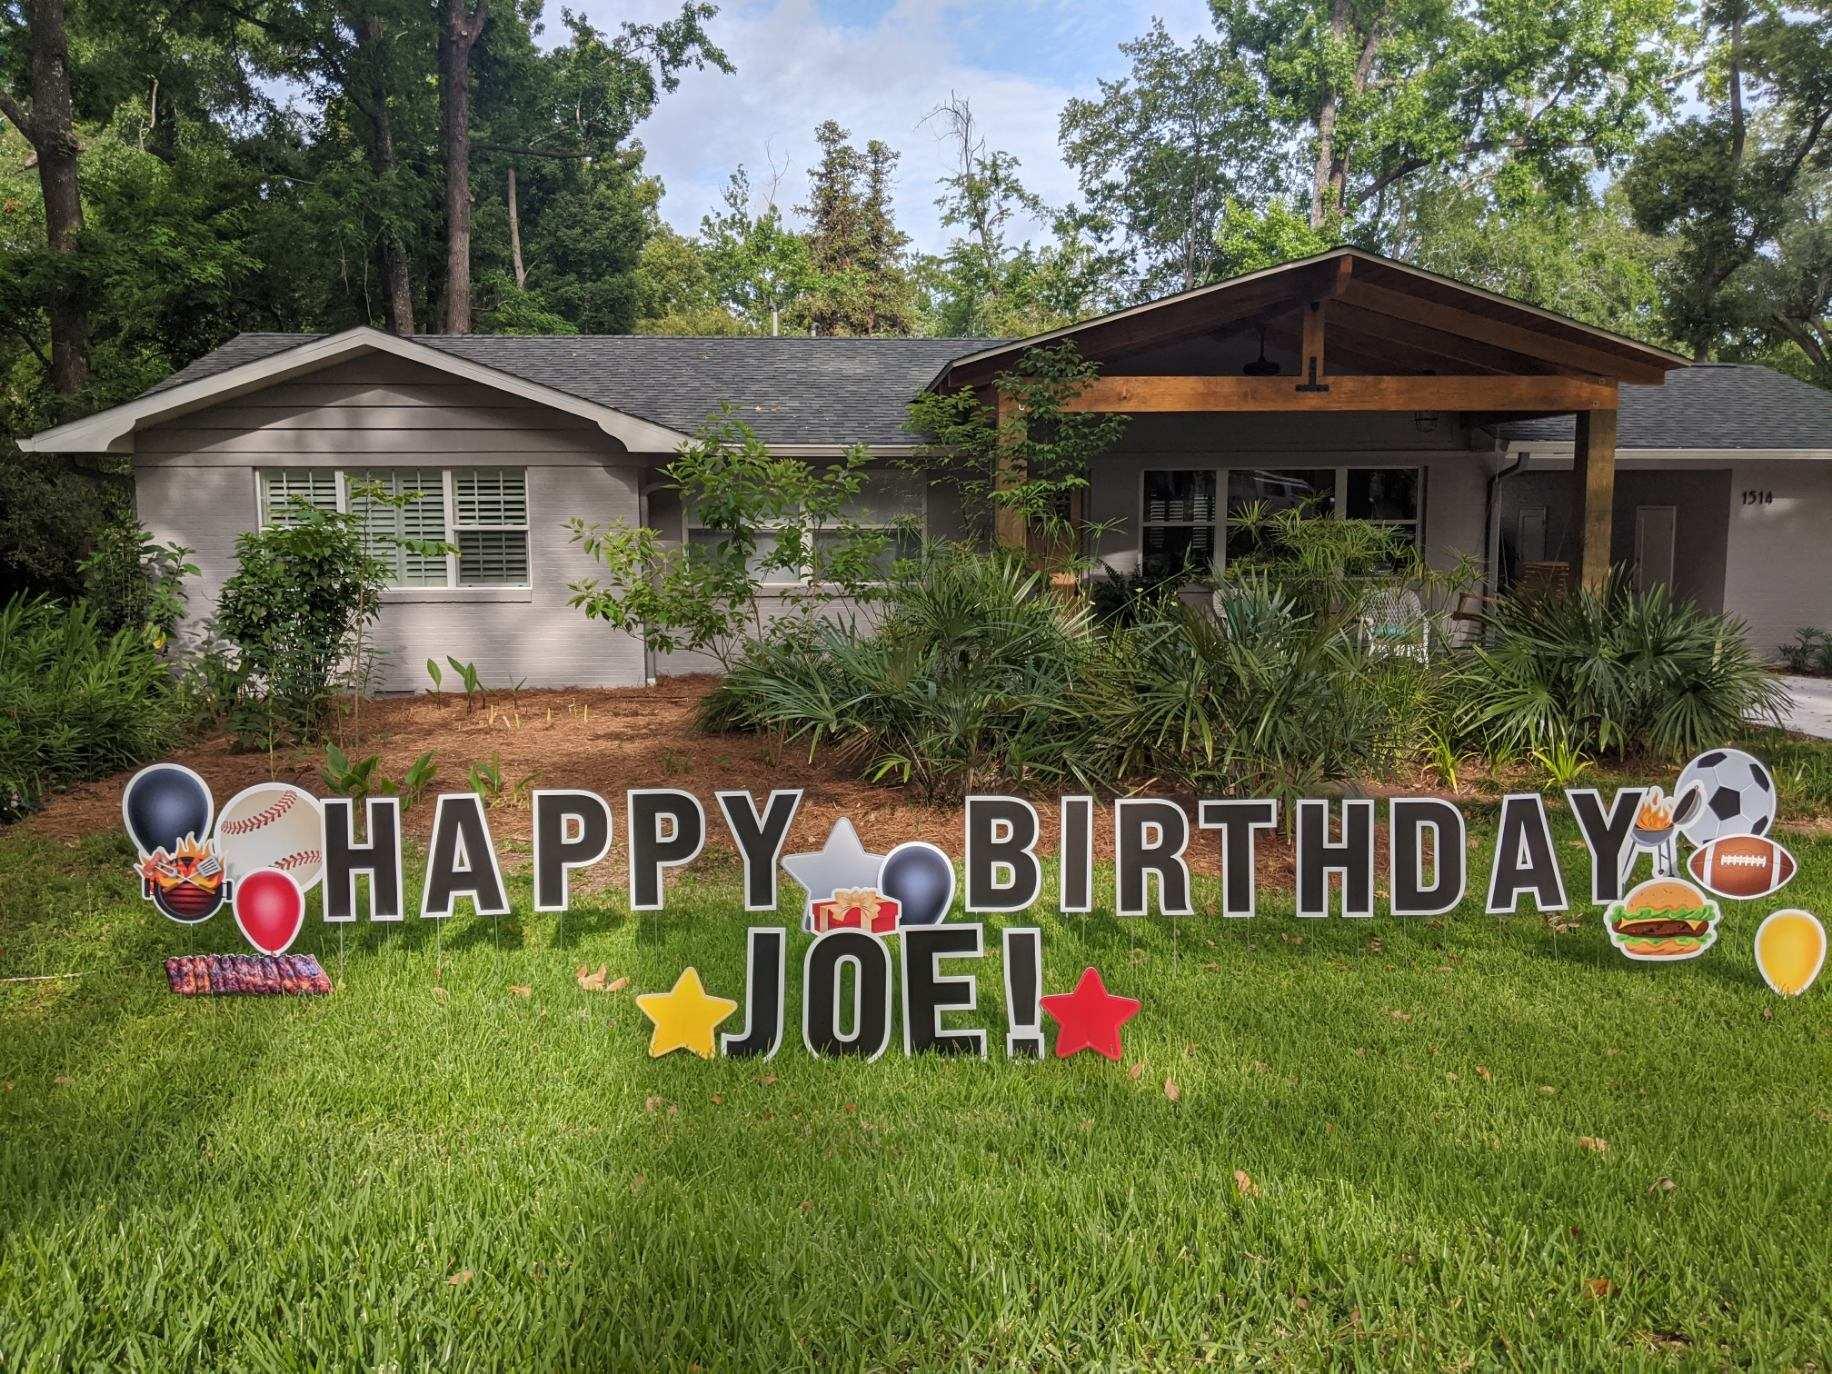 Joes Birthday